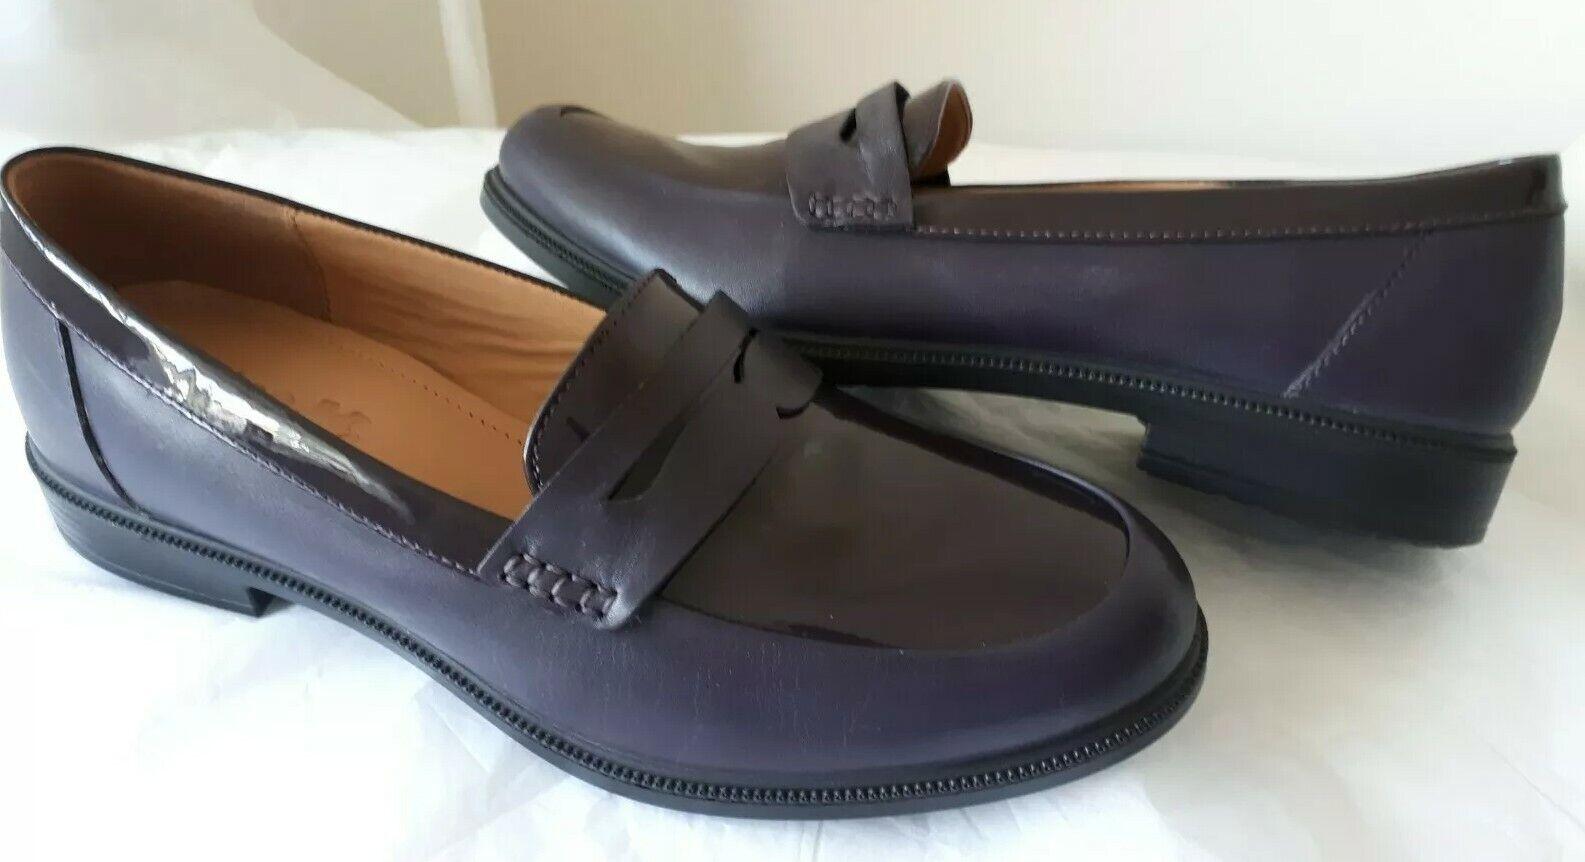 NEUF Hotter Dorset Plum brevet Cuir Mocassin Chaussures Taille UK 8 Std Ajustés.